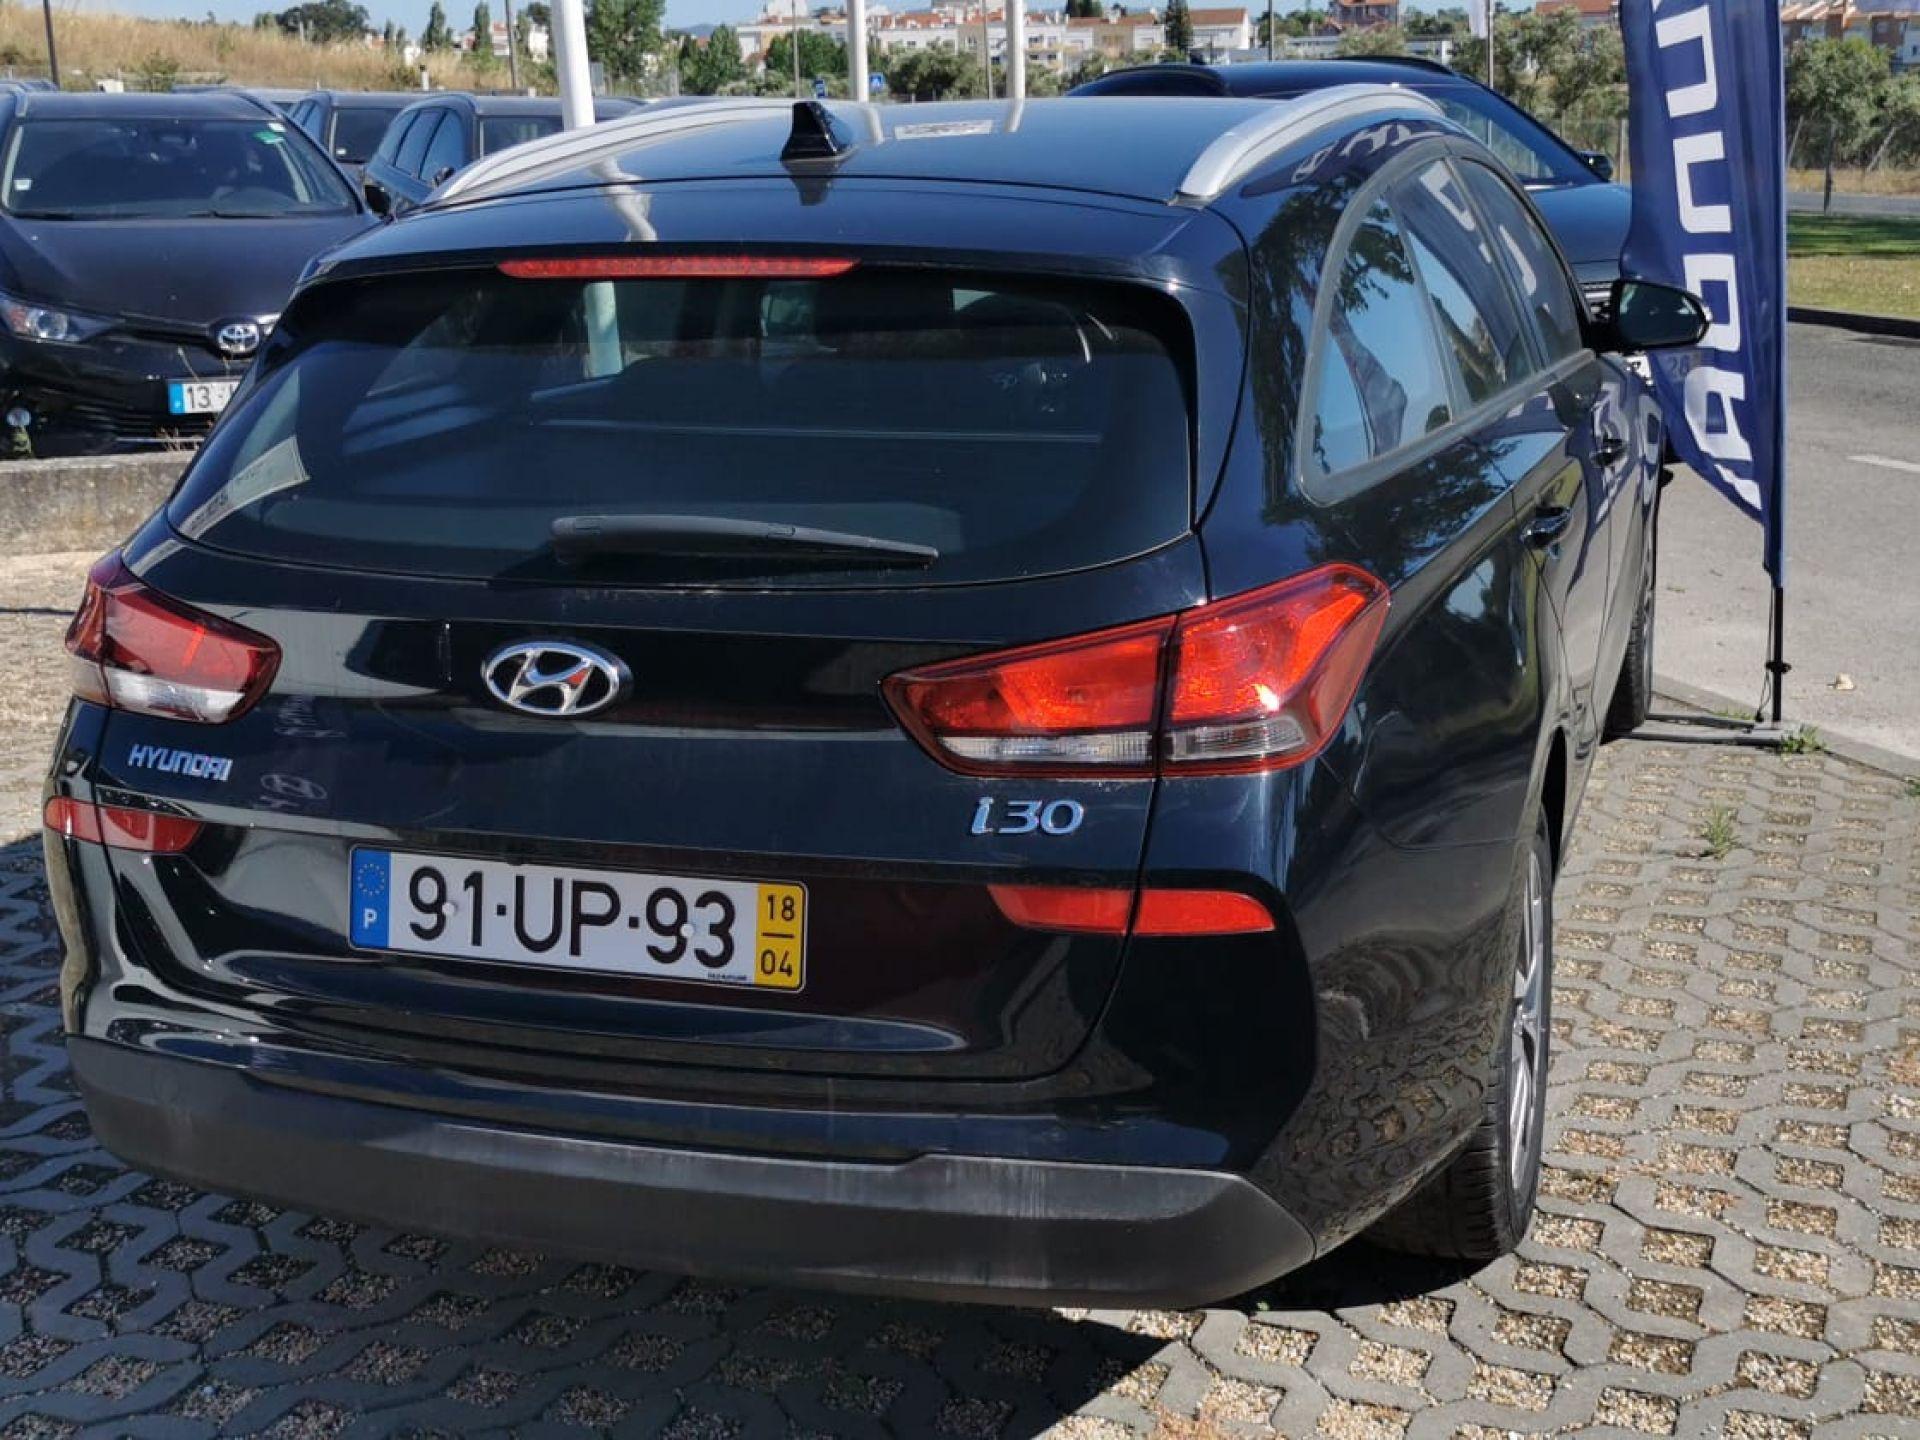 Hyundai i30 SW 1.6 CRDi COMFORT + BTL + NAV 110CV segunda mão Setúbal